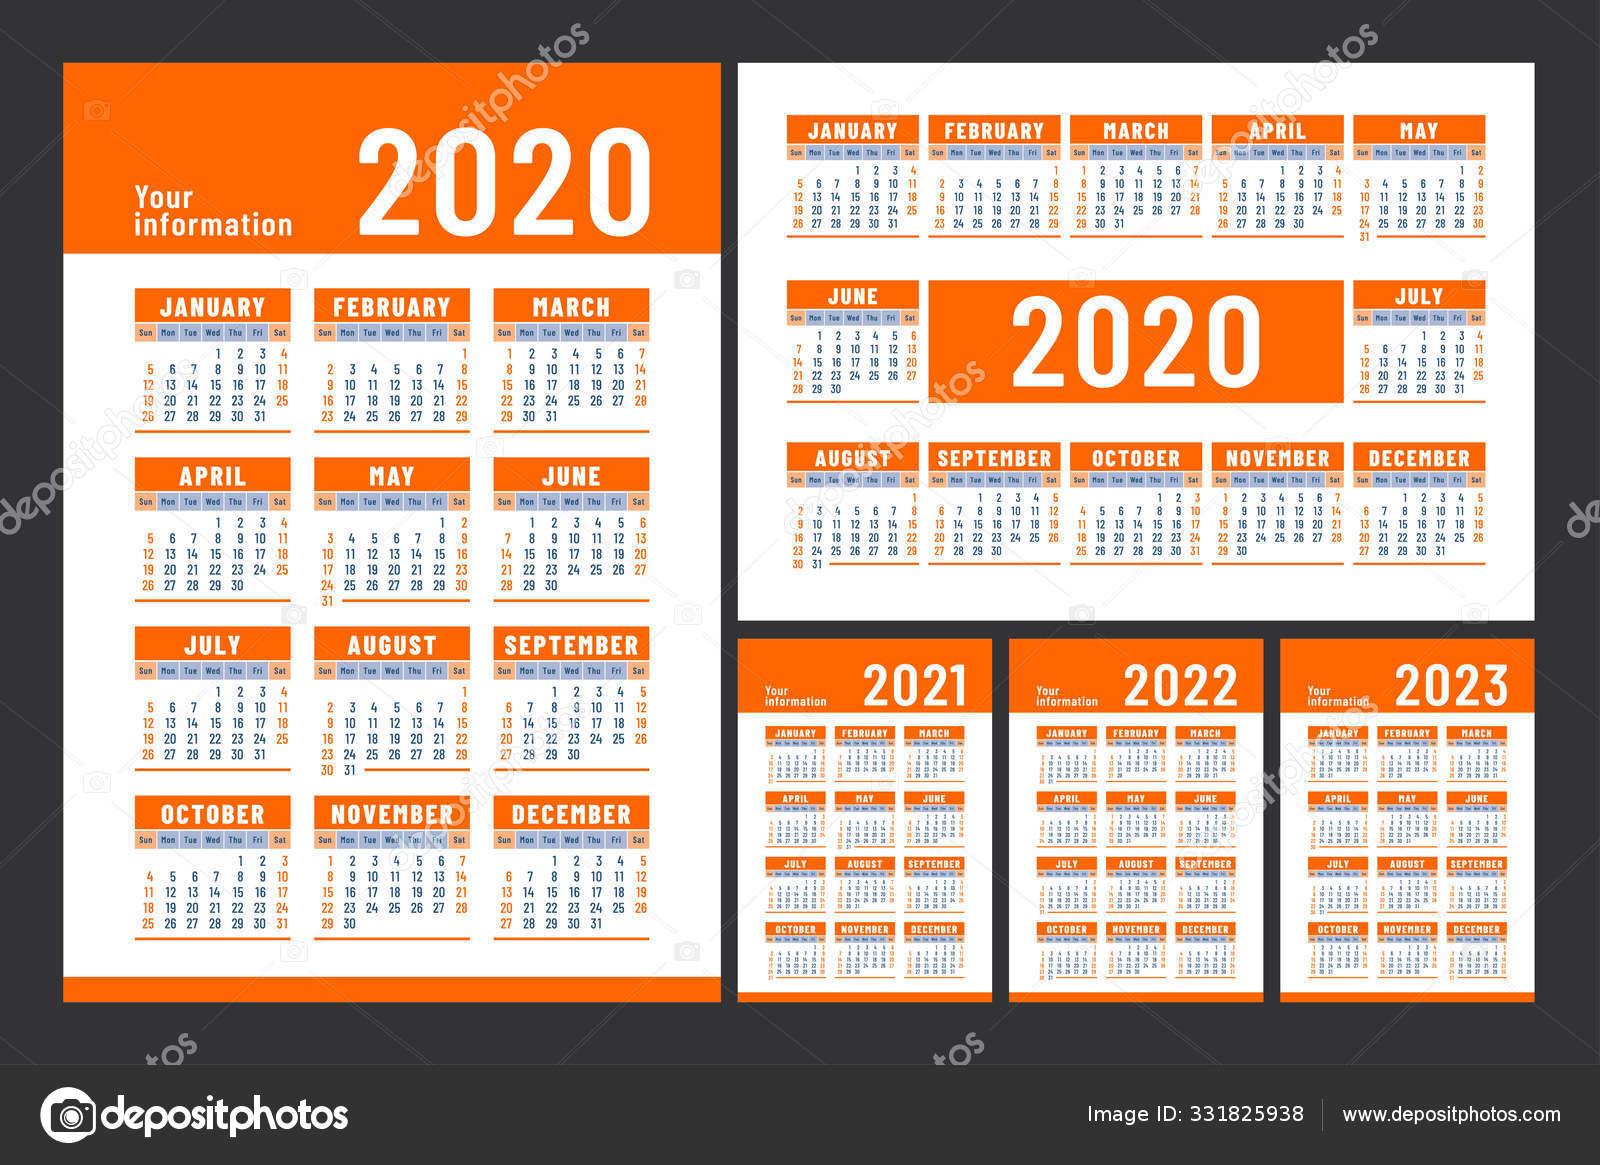 2022 2023 Pocket Calendar.Calendar 2020 2021 2022 2023 English Color Vector Set Wall Vector Image By C Ra Khusnullina Gmail Com14722860aef0a814722860 Vector Stock 331825938